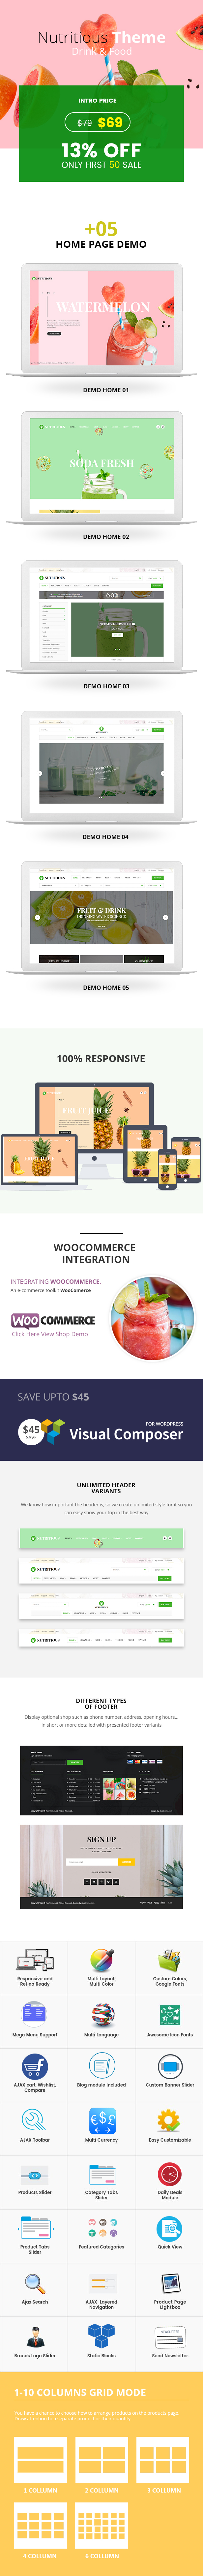 Nahrhaft - Bio-Lebensmittel WooCommerce Template - 4